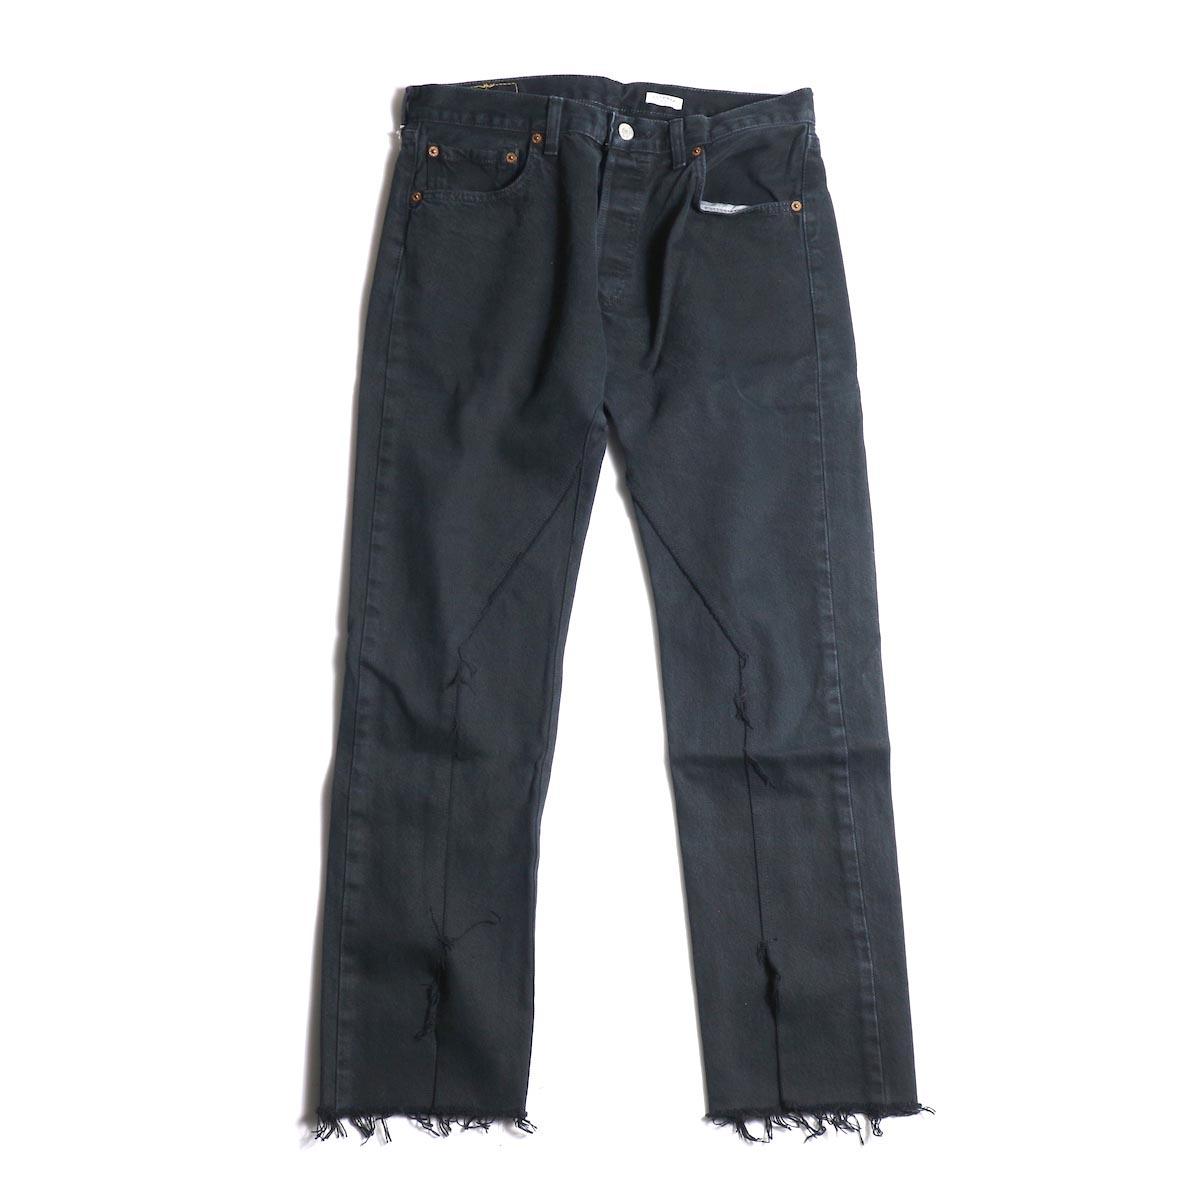 OLD PARK / Slit Jeans (Black) (Msize-B)